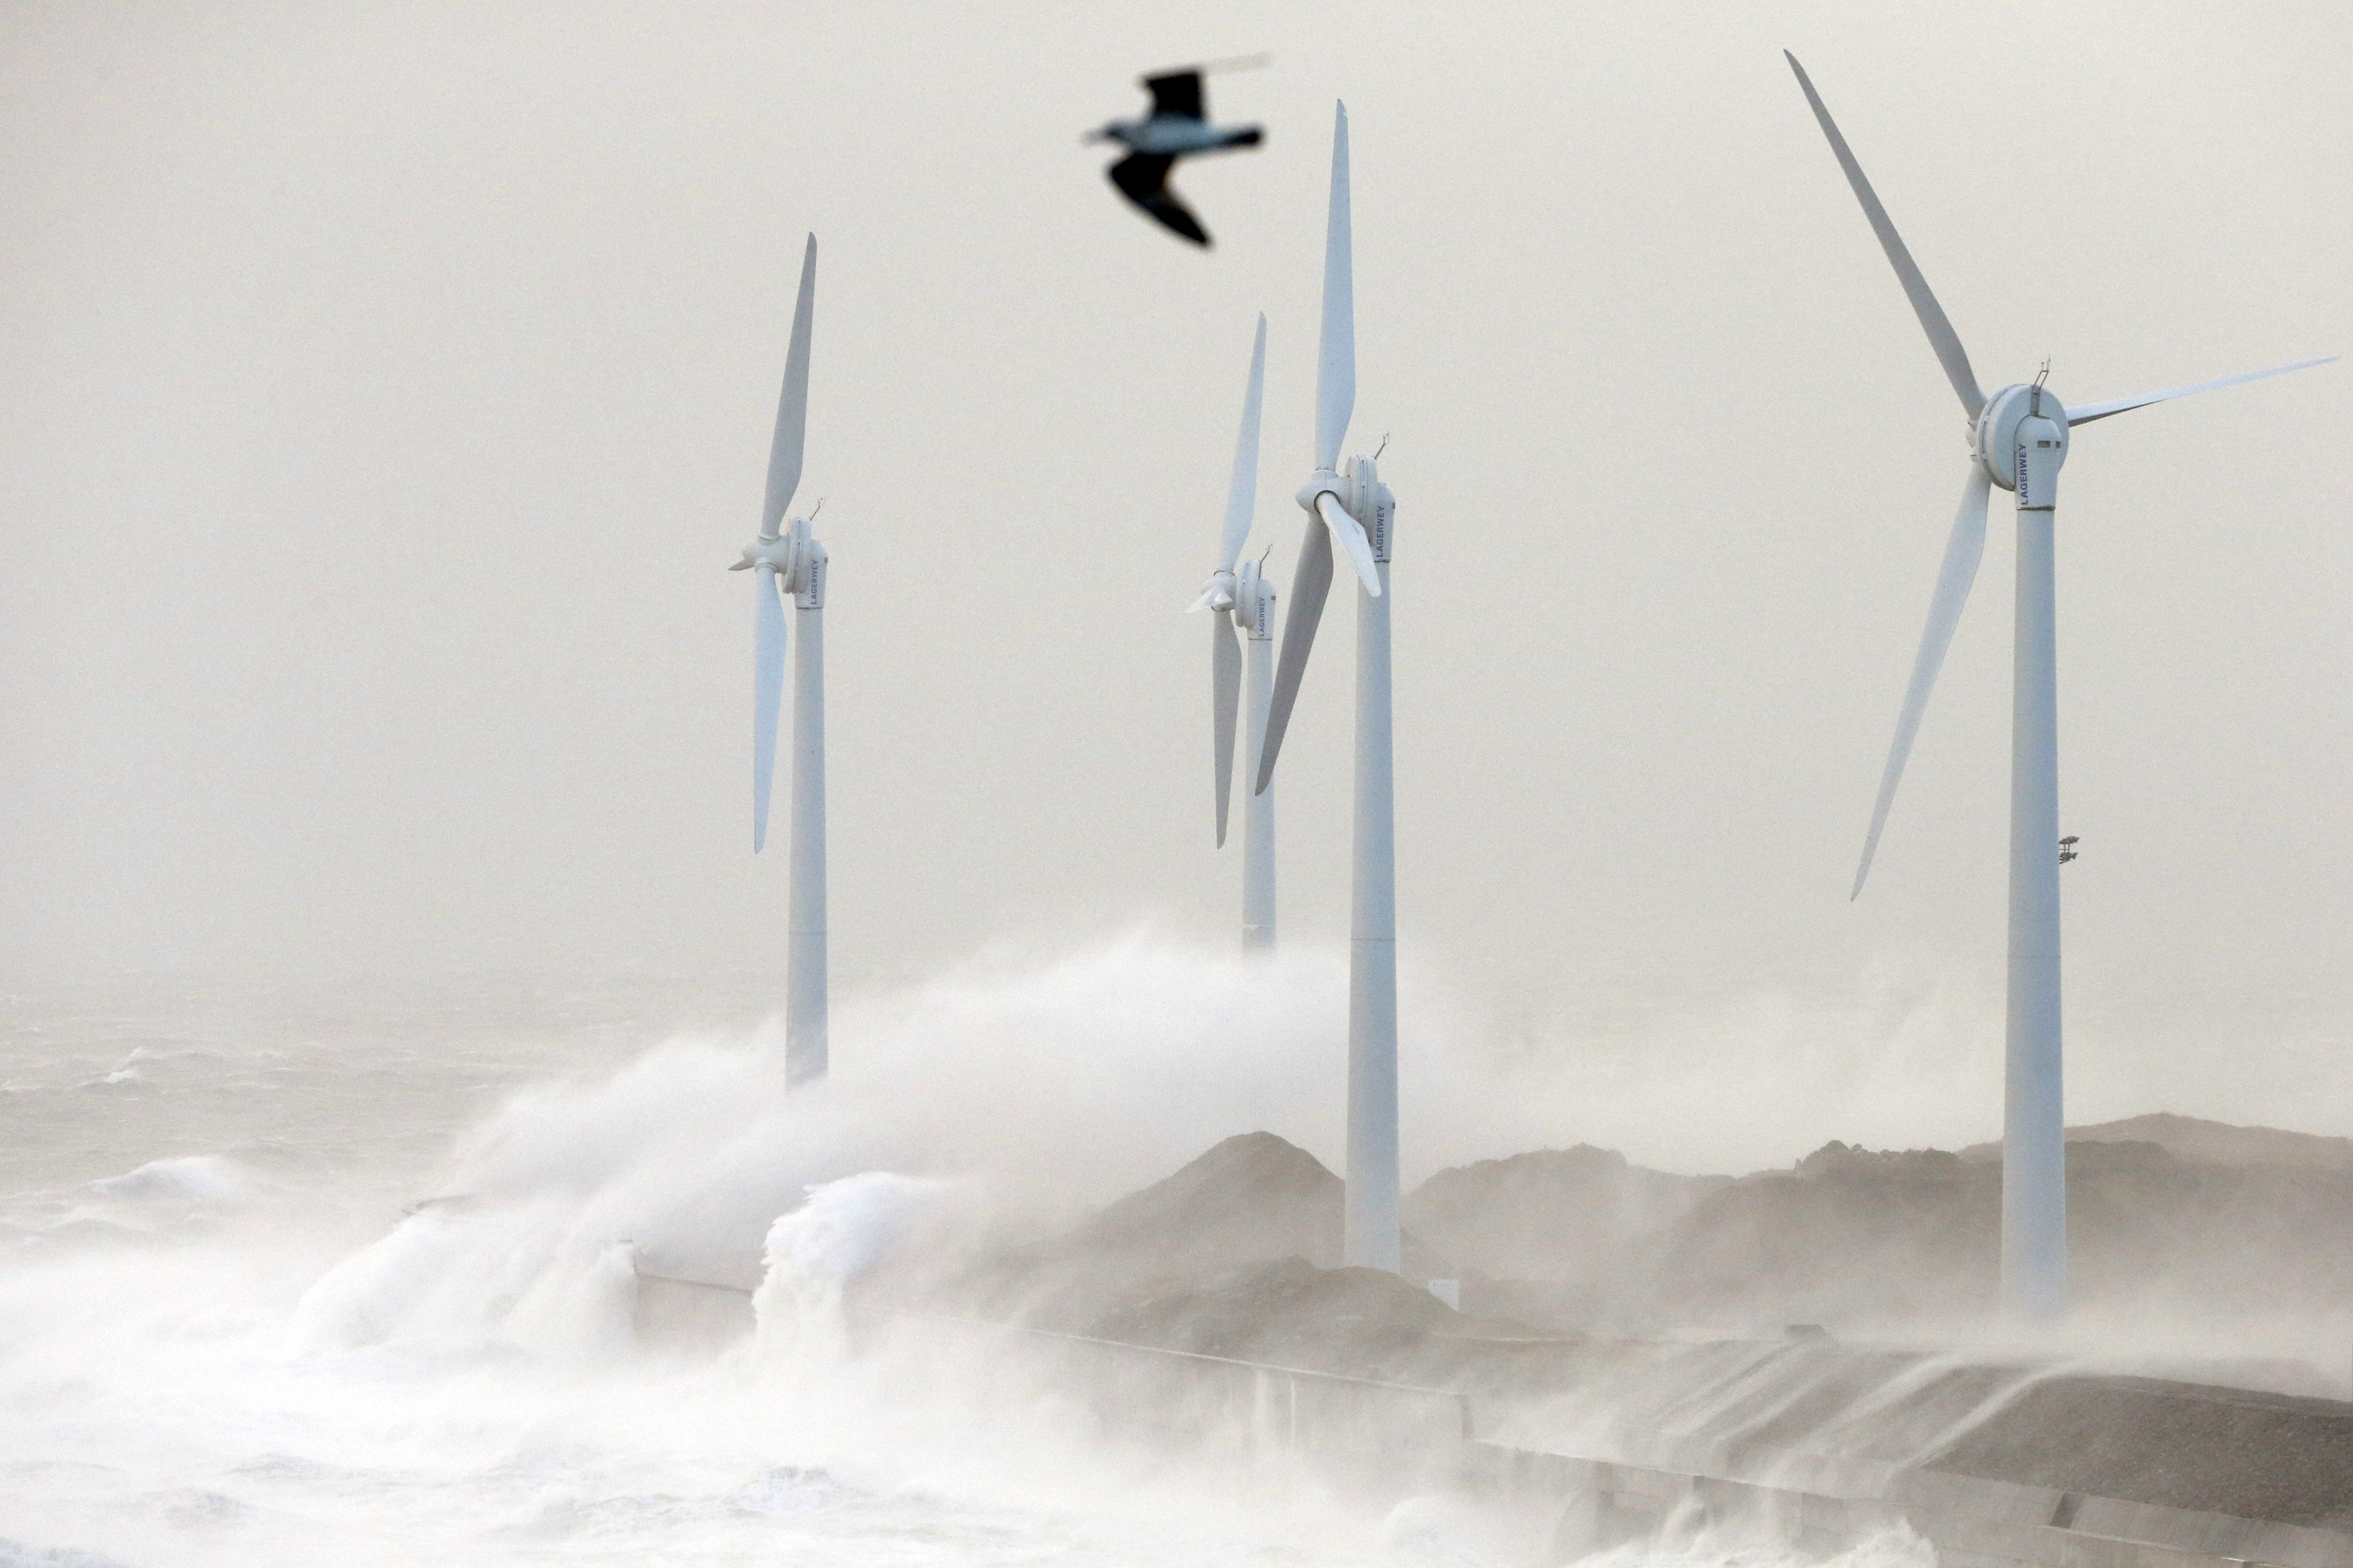 Waves crash against wind turbines during a storm named Christian that battered France at Boulogne sur Mer, northern France, October 28, 2013.